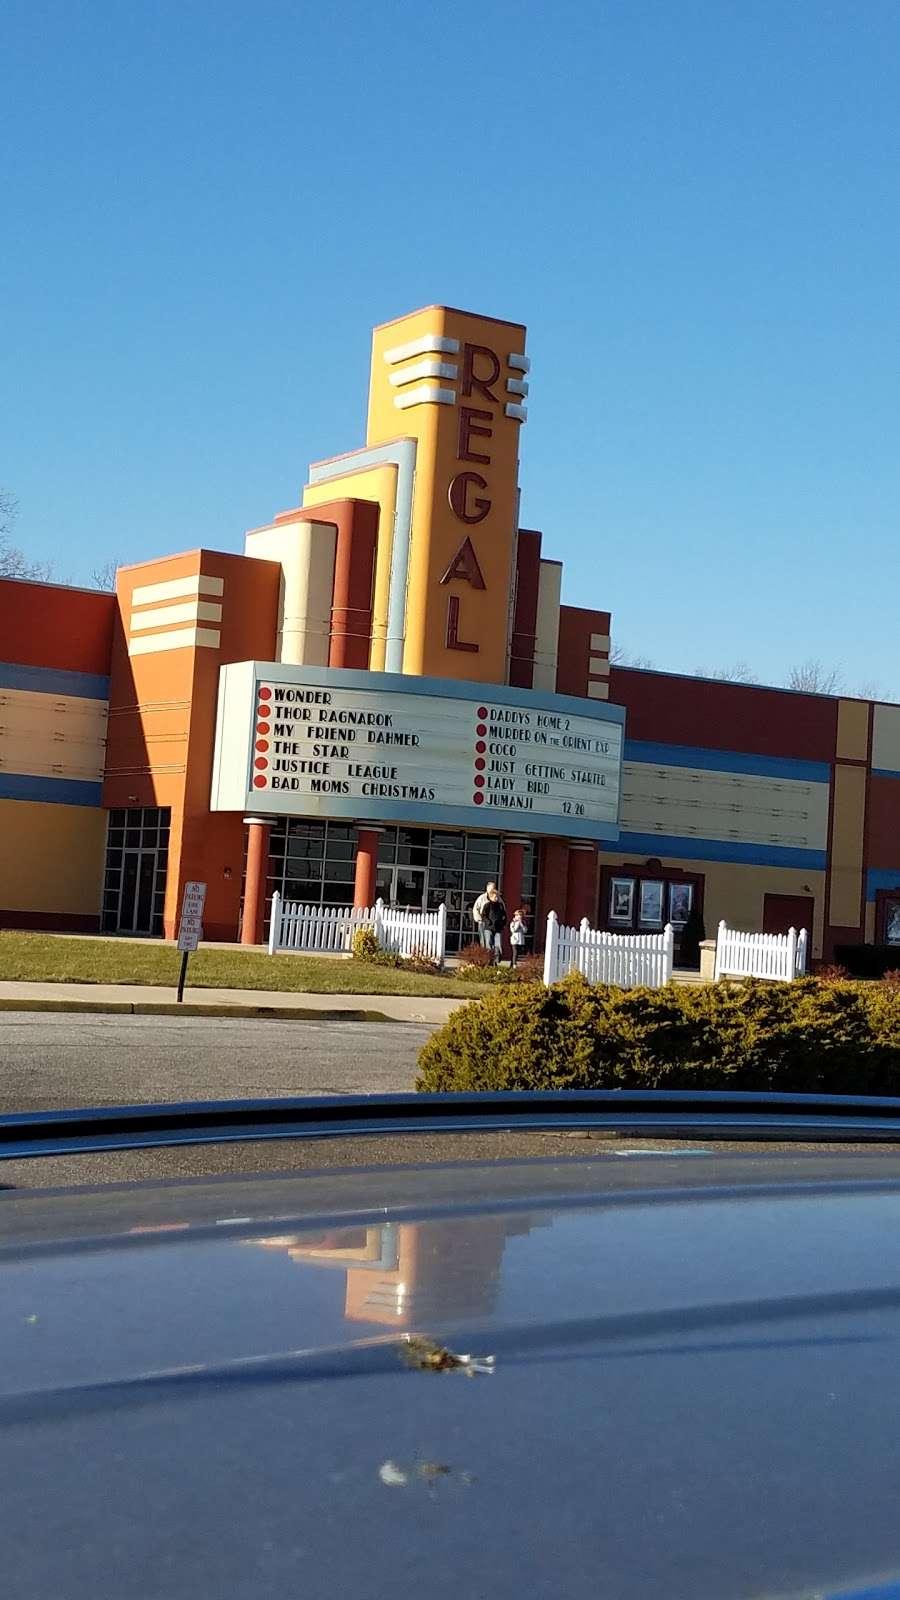 Amc Marlton 8 >> Regal Cinemas Cross Keys 12 - Movie theater | 151 American Blvd, Turnersville, NJ 08012, USA